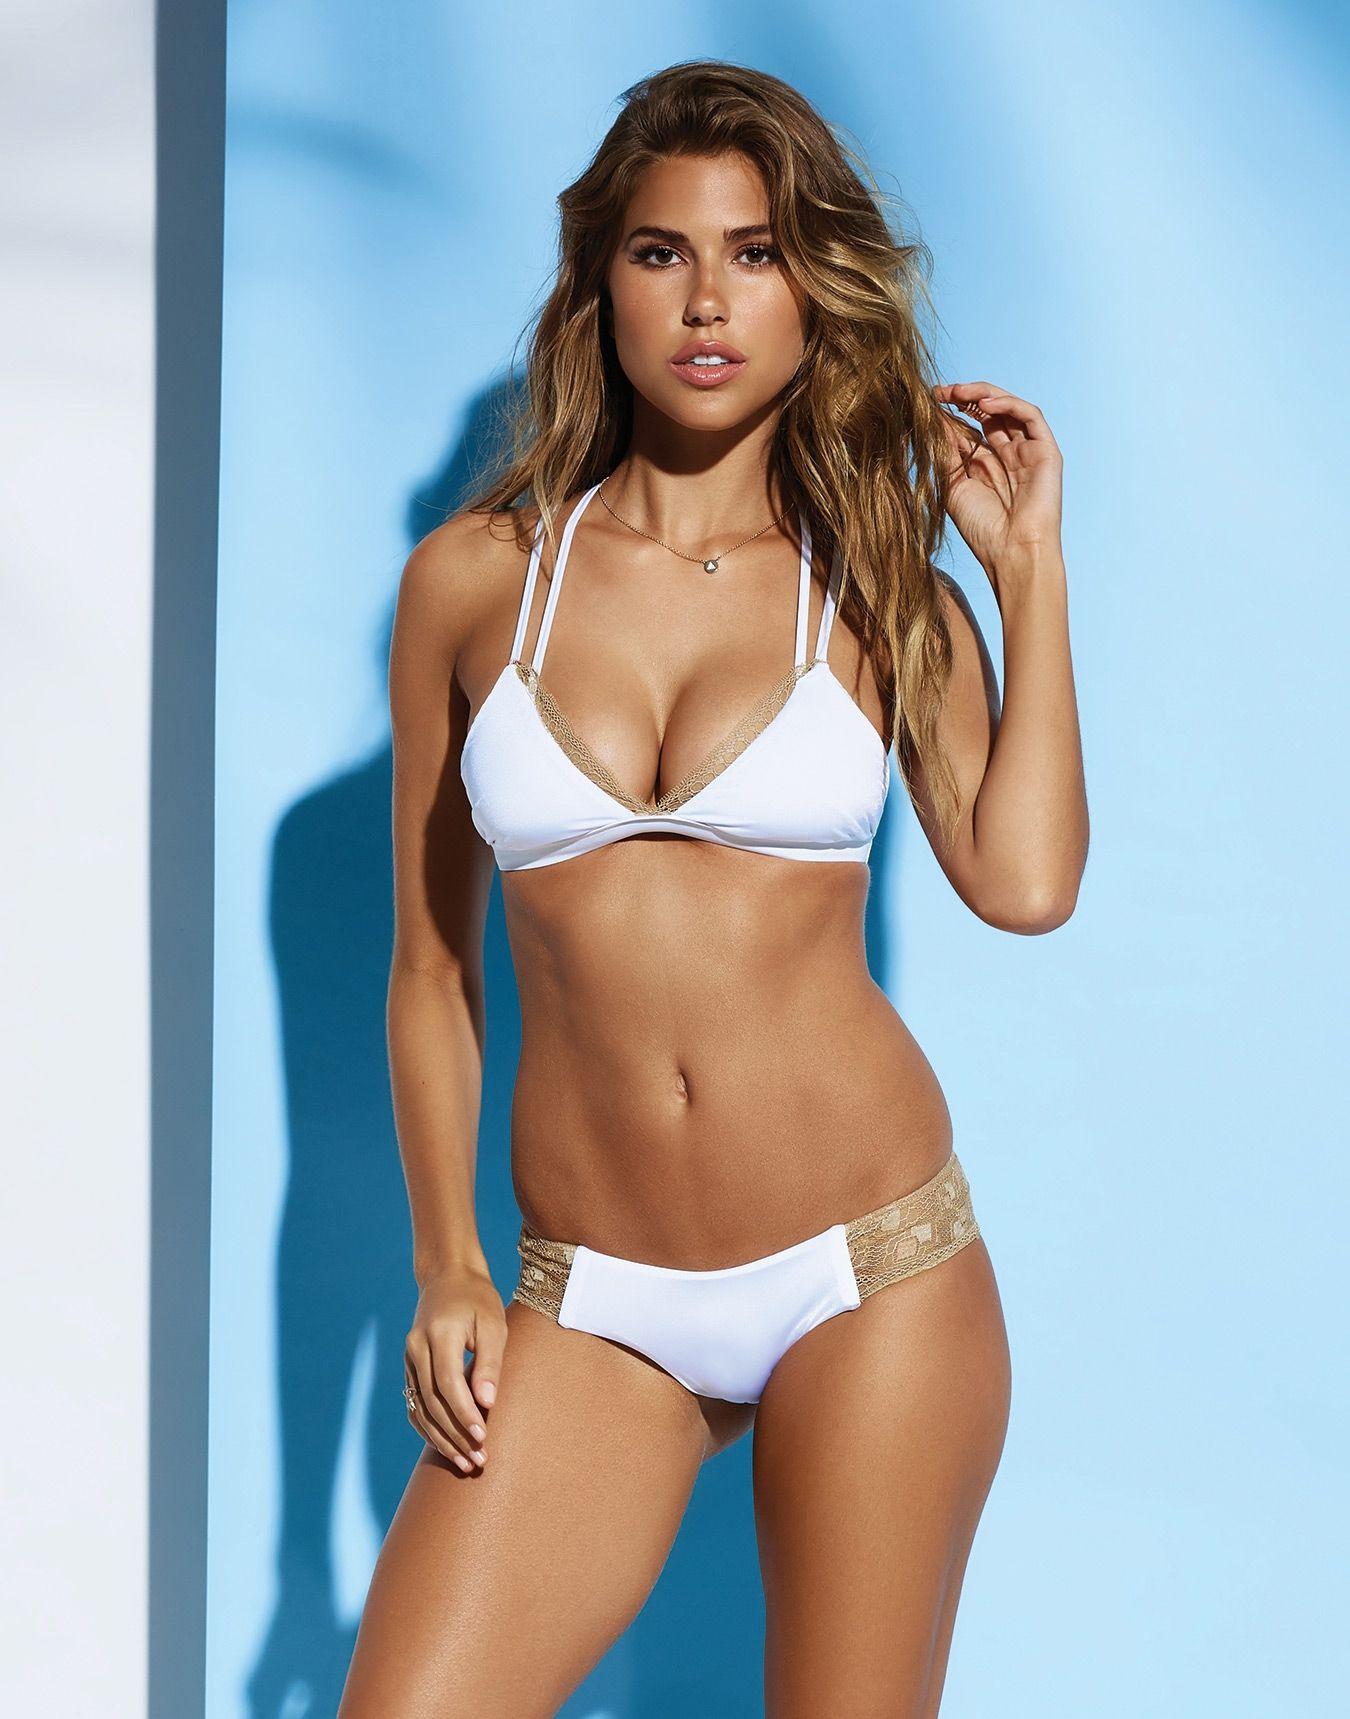 Bikini CBikiniie Mason nude (54 photos), Topless, Cleavage, Boobs, panties 2017